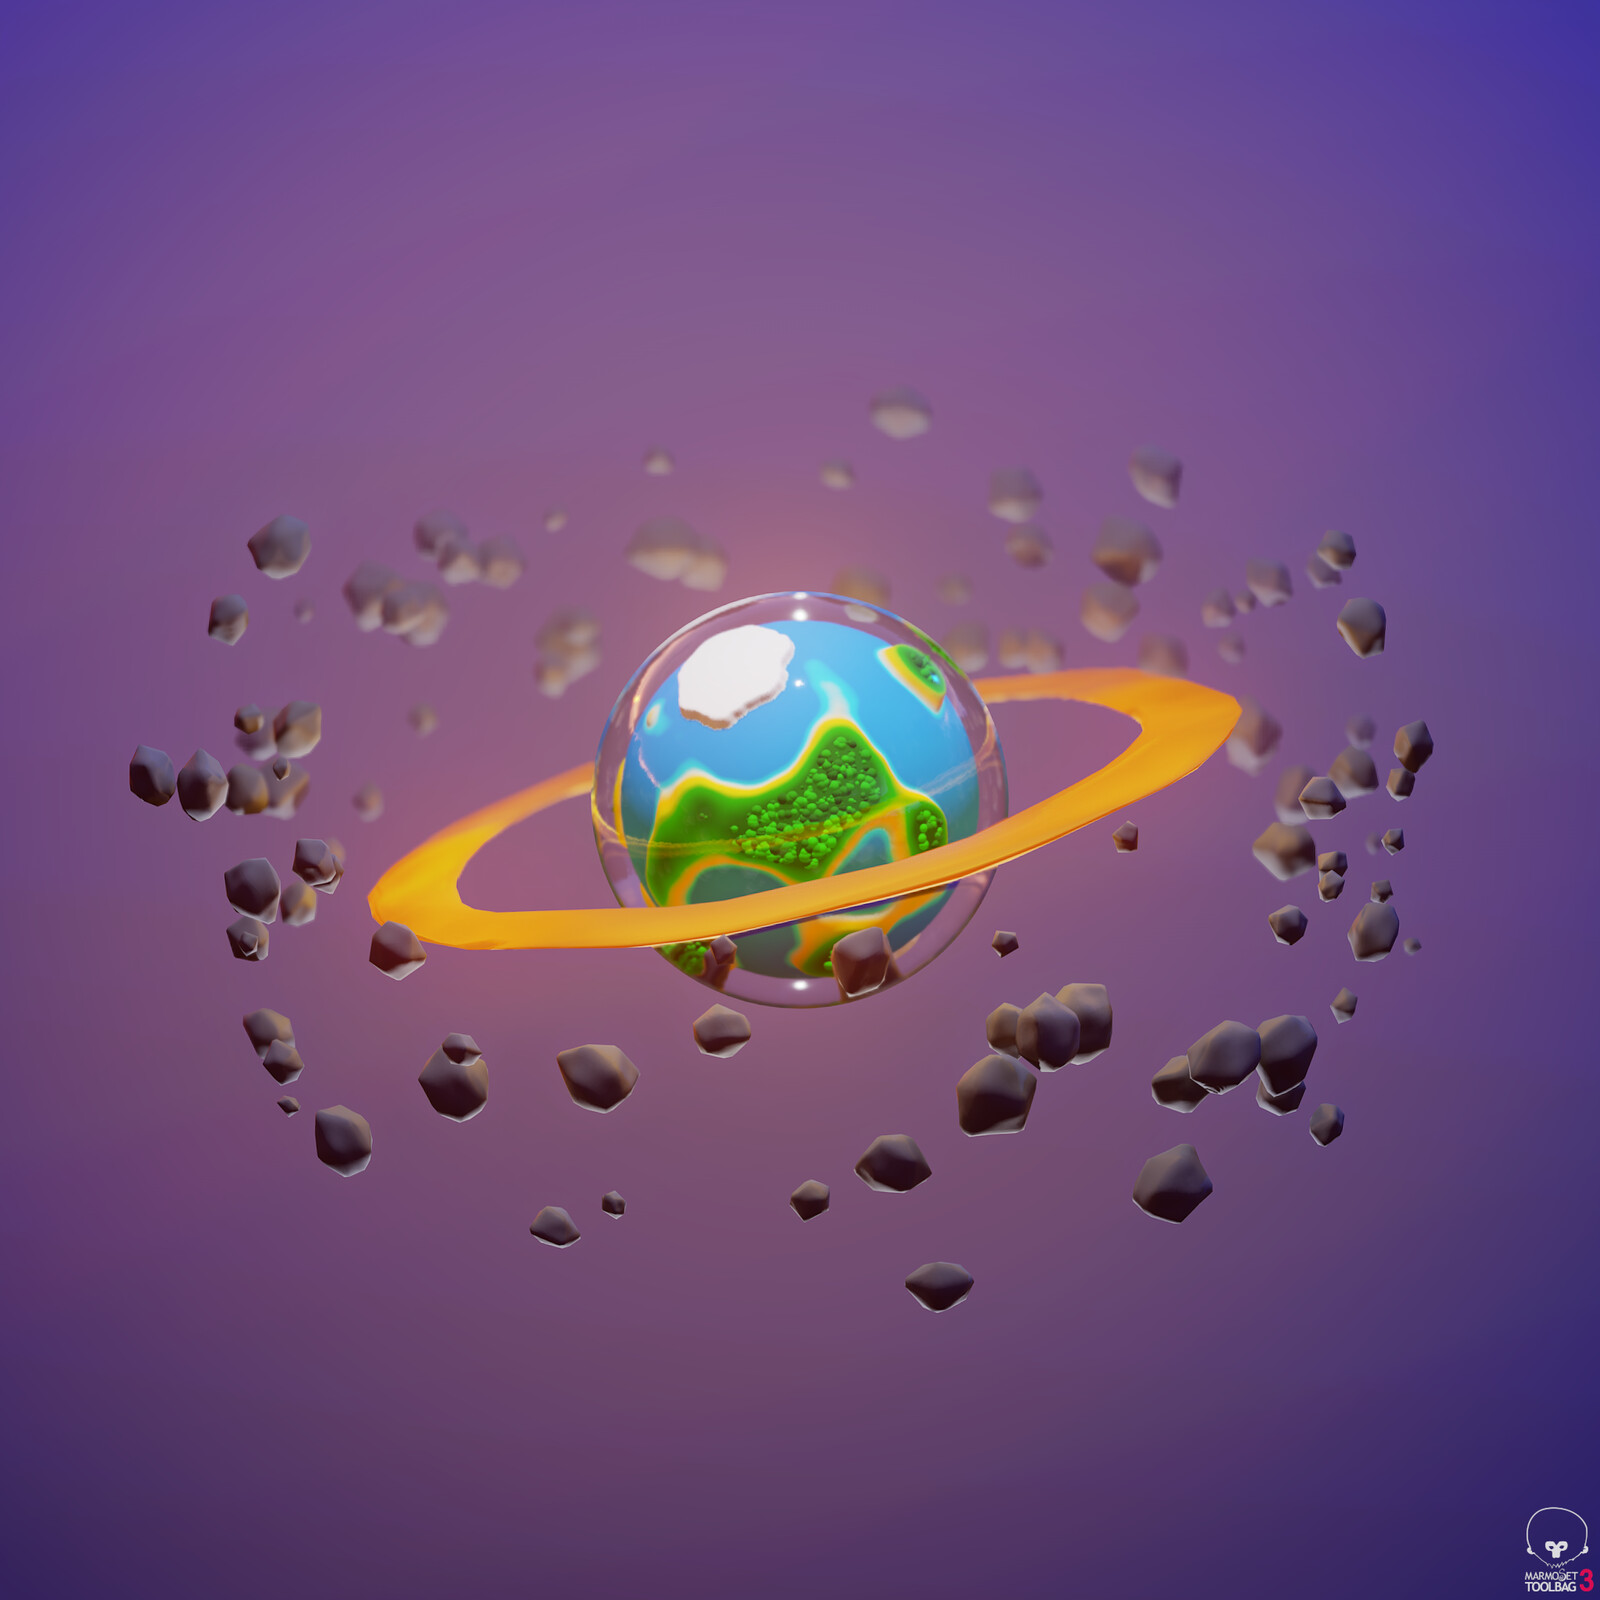 STYLIZED PROCEDURAL PLANET ECOSYSTEM